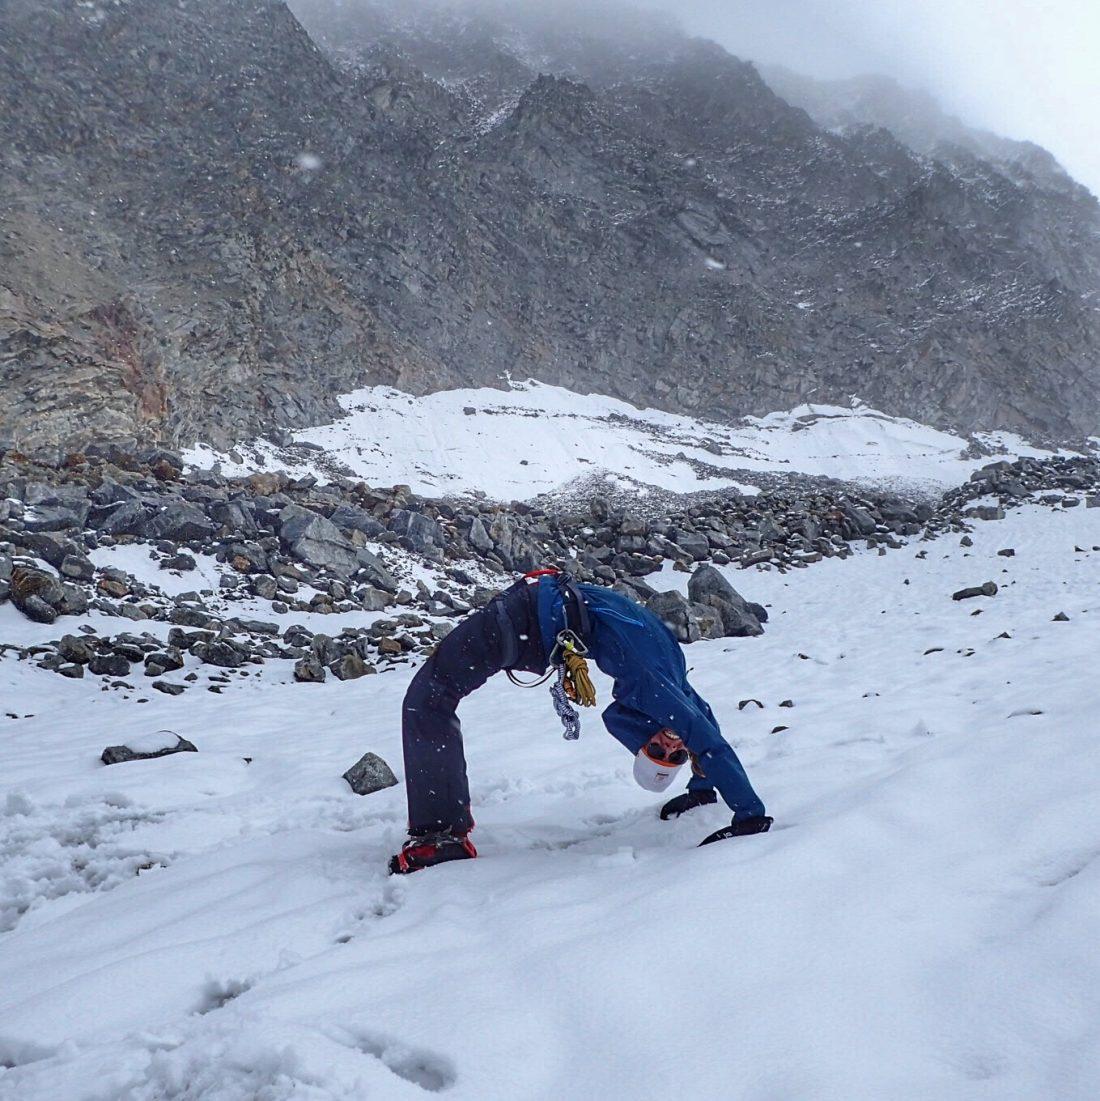 Yoga in de sneeuw en op een gletsjer - wanderlotje